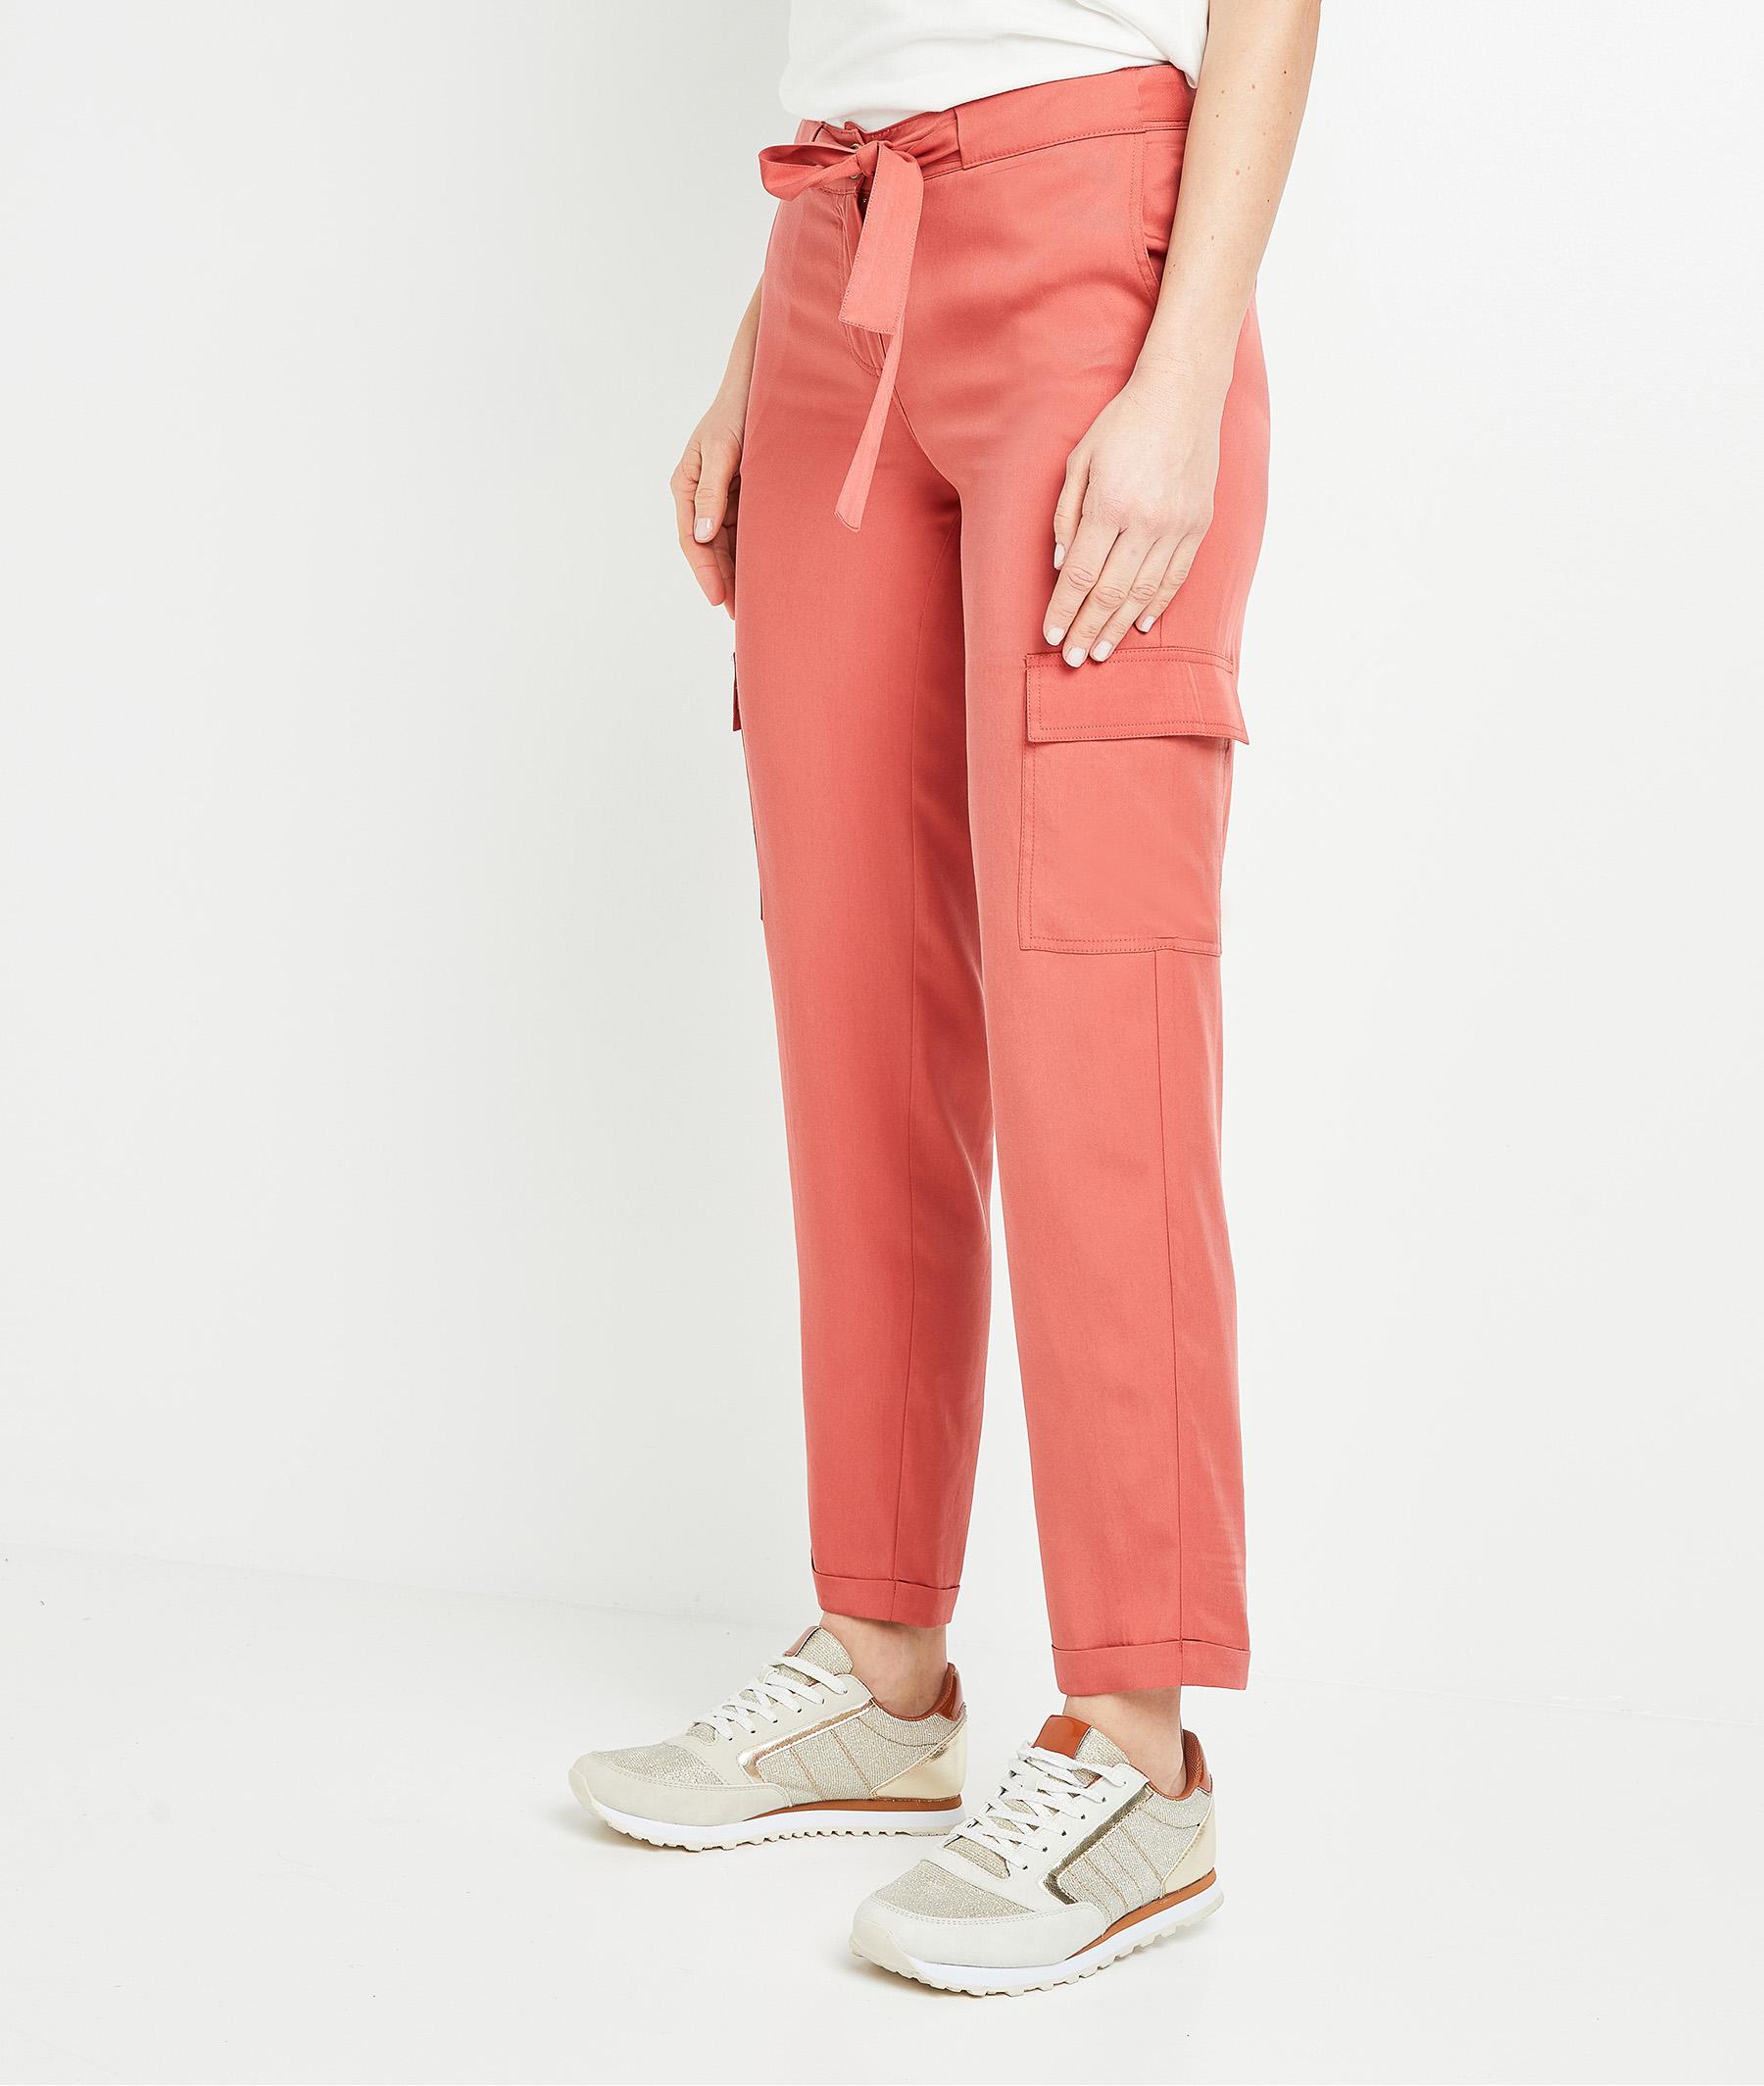 Pantalon chino en lyocell femme TERRACOTTA